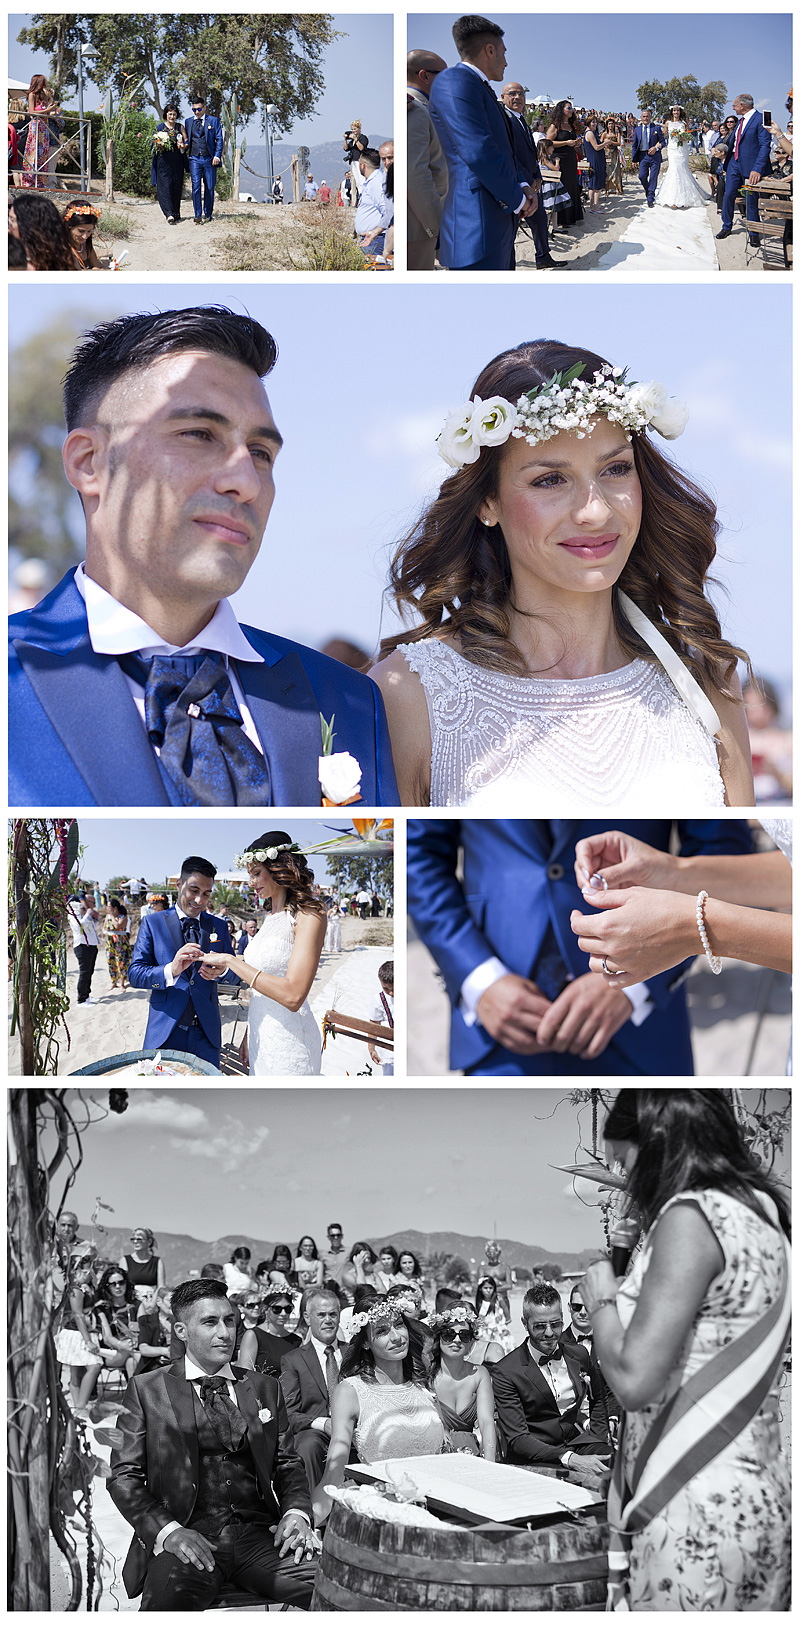 sposa_bride_matrimonio_wedding_Matrimonio_cagliari_ceriomonia_sposo_nora